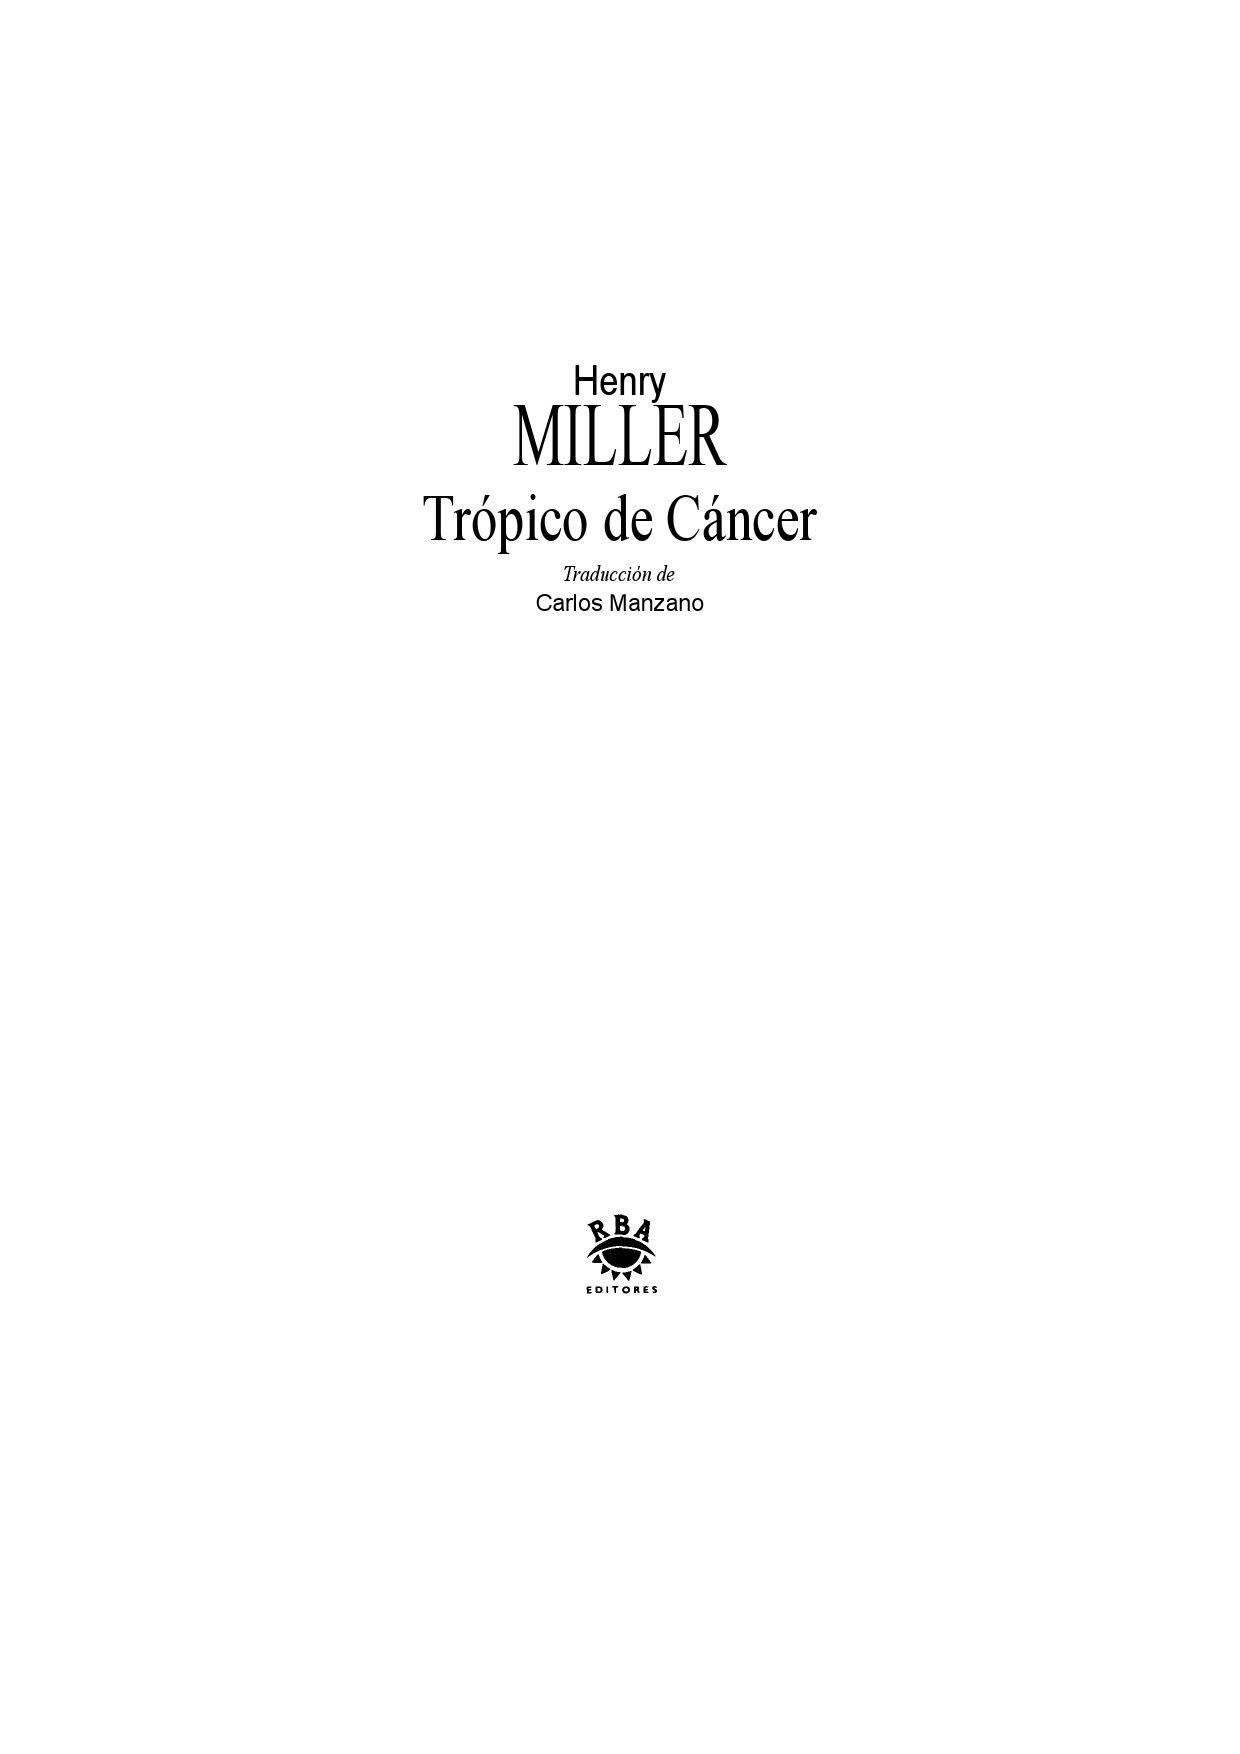 Tropico de Cancer by sugey lopez - issuu